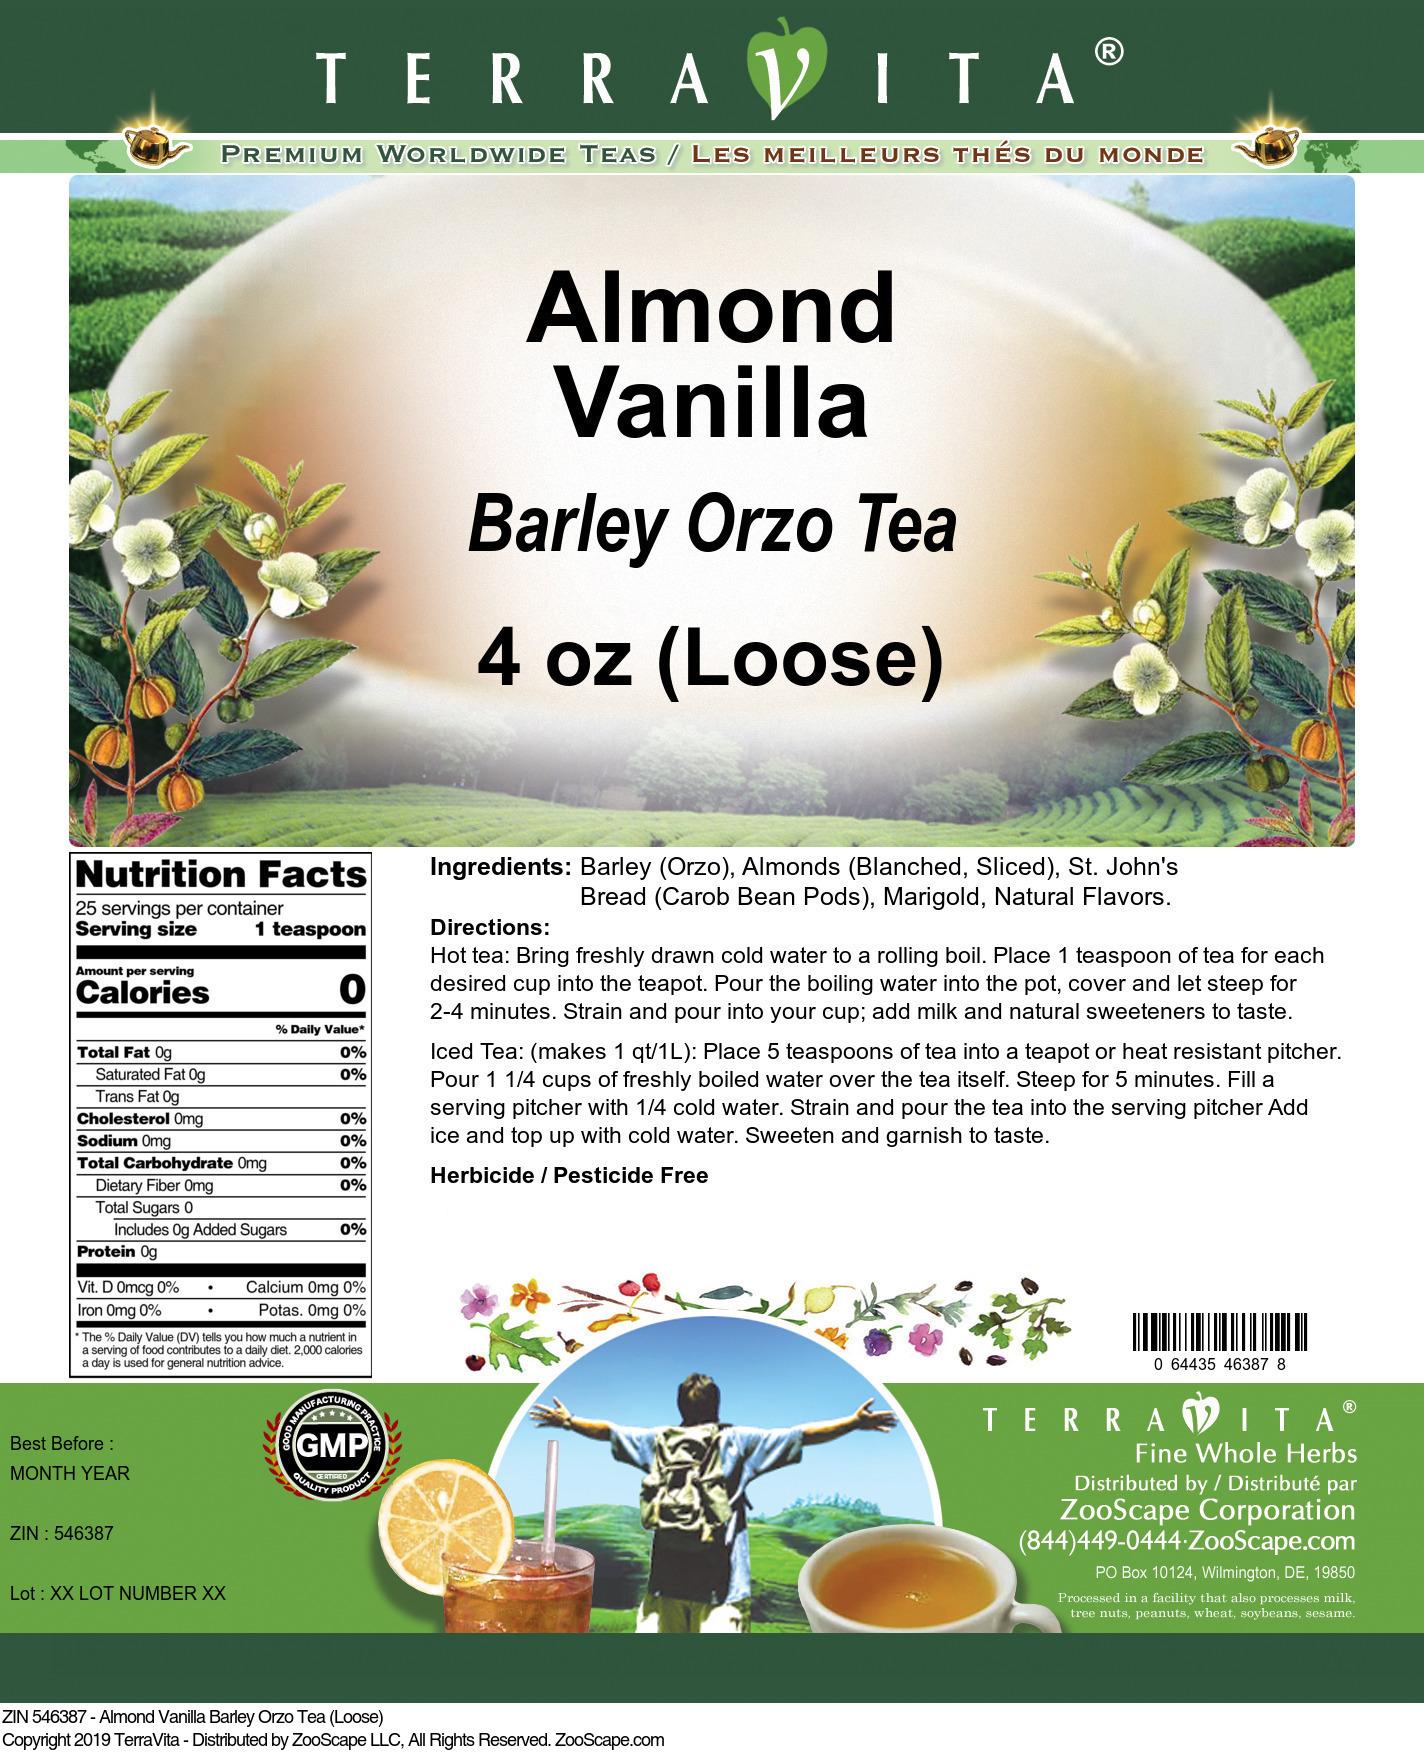 Almond Vanilla Barley Orzo Tea (Loose)